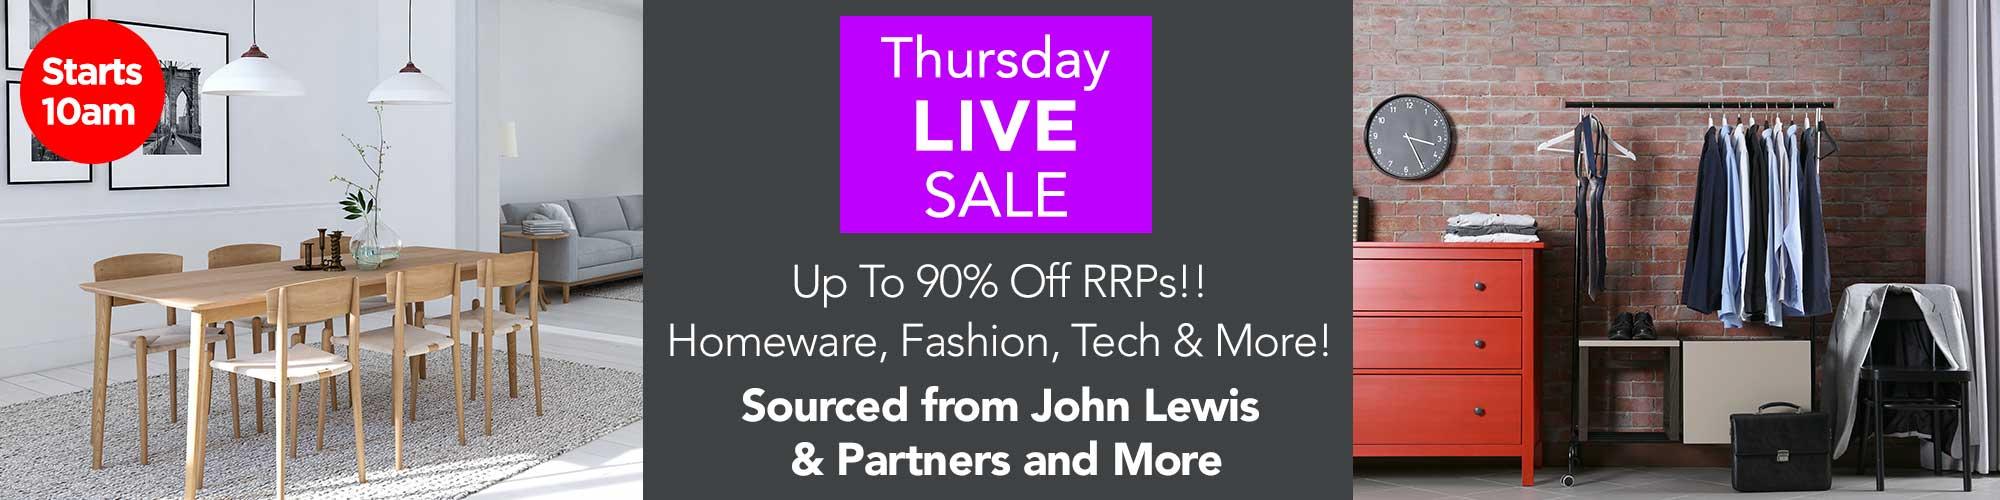 Thursday Live Mega Sale! Bid from 10am sharp!!